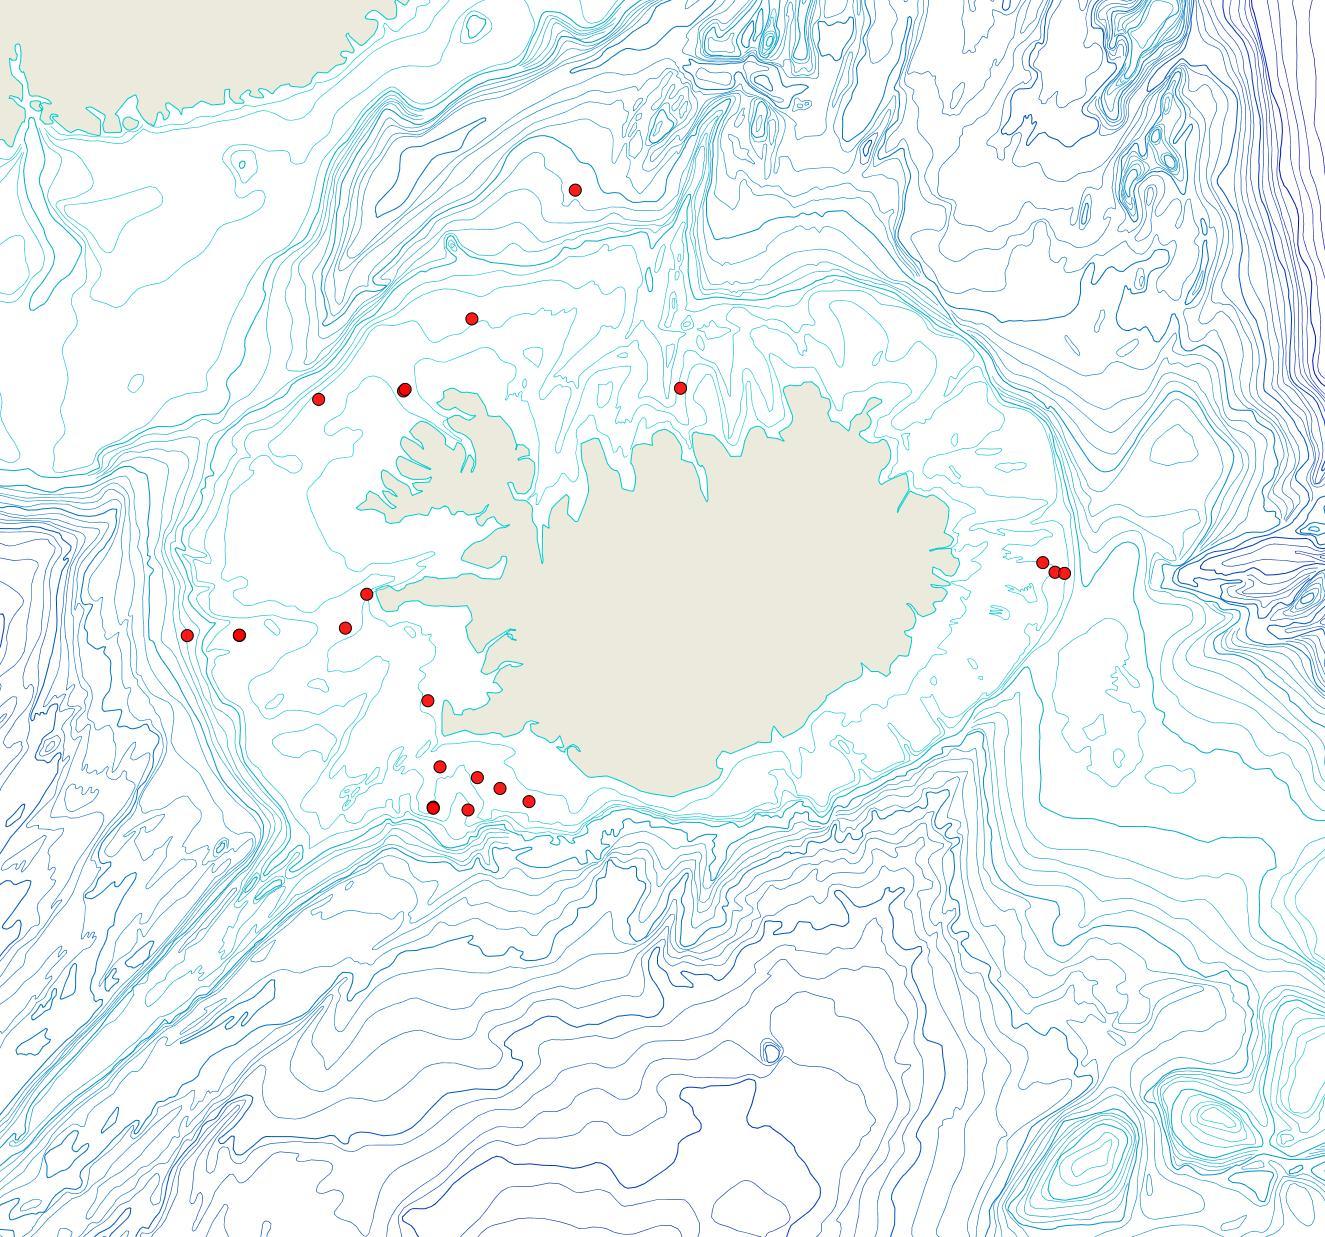 Útbreiðsla Porella patula(Bioice samples, red dots)